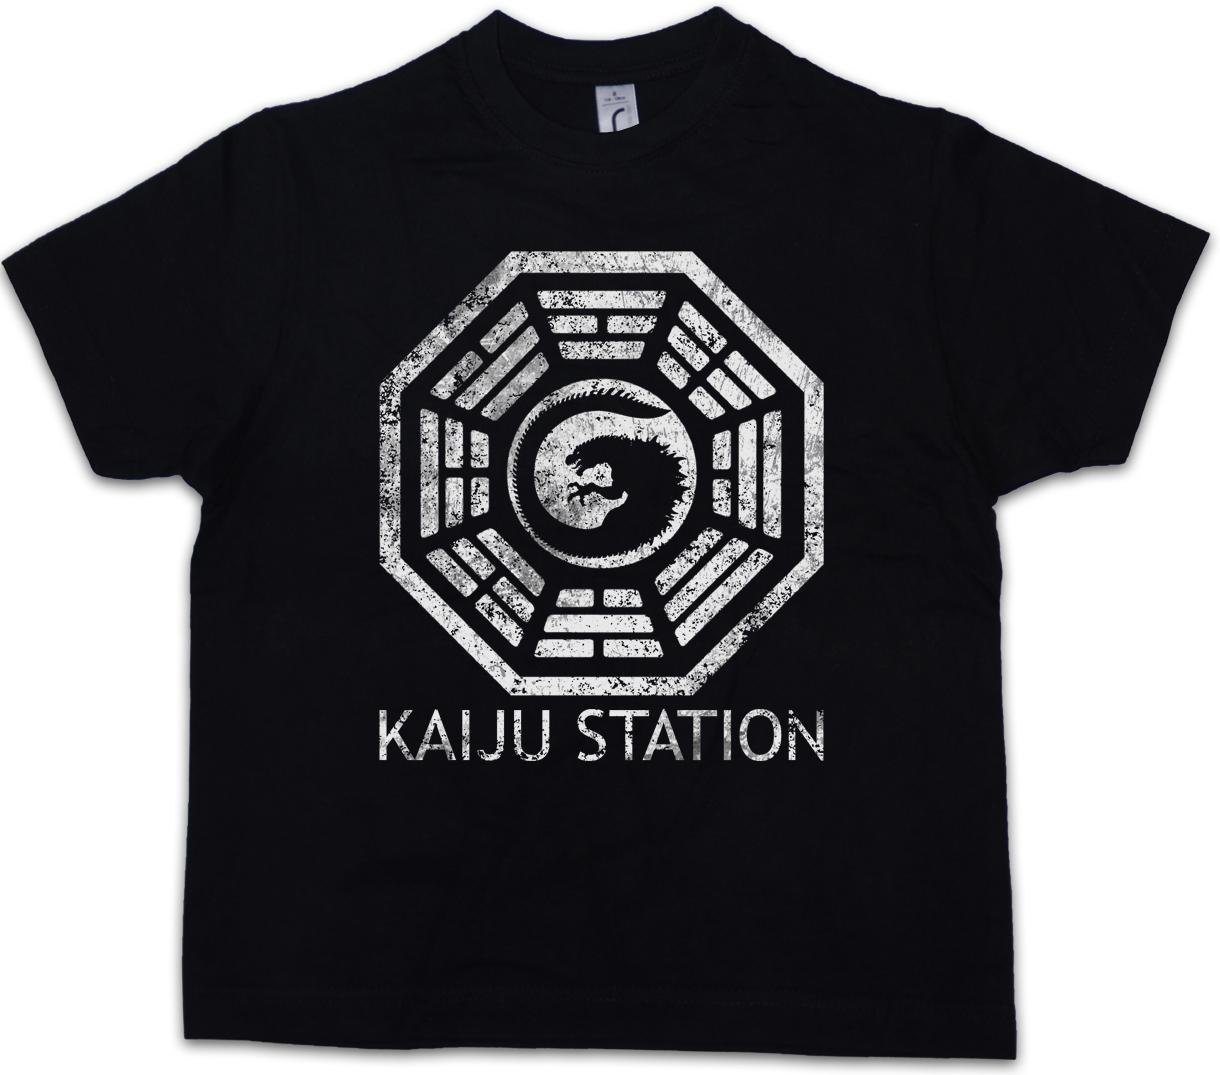 STRIKER EUREKA LOGO Kids Boys T-Shirt Del Toro Kaiju Gipsy Danger Pacific Rim